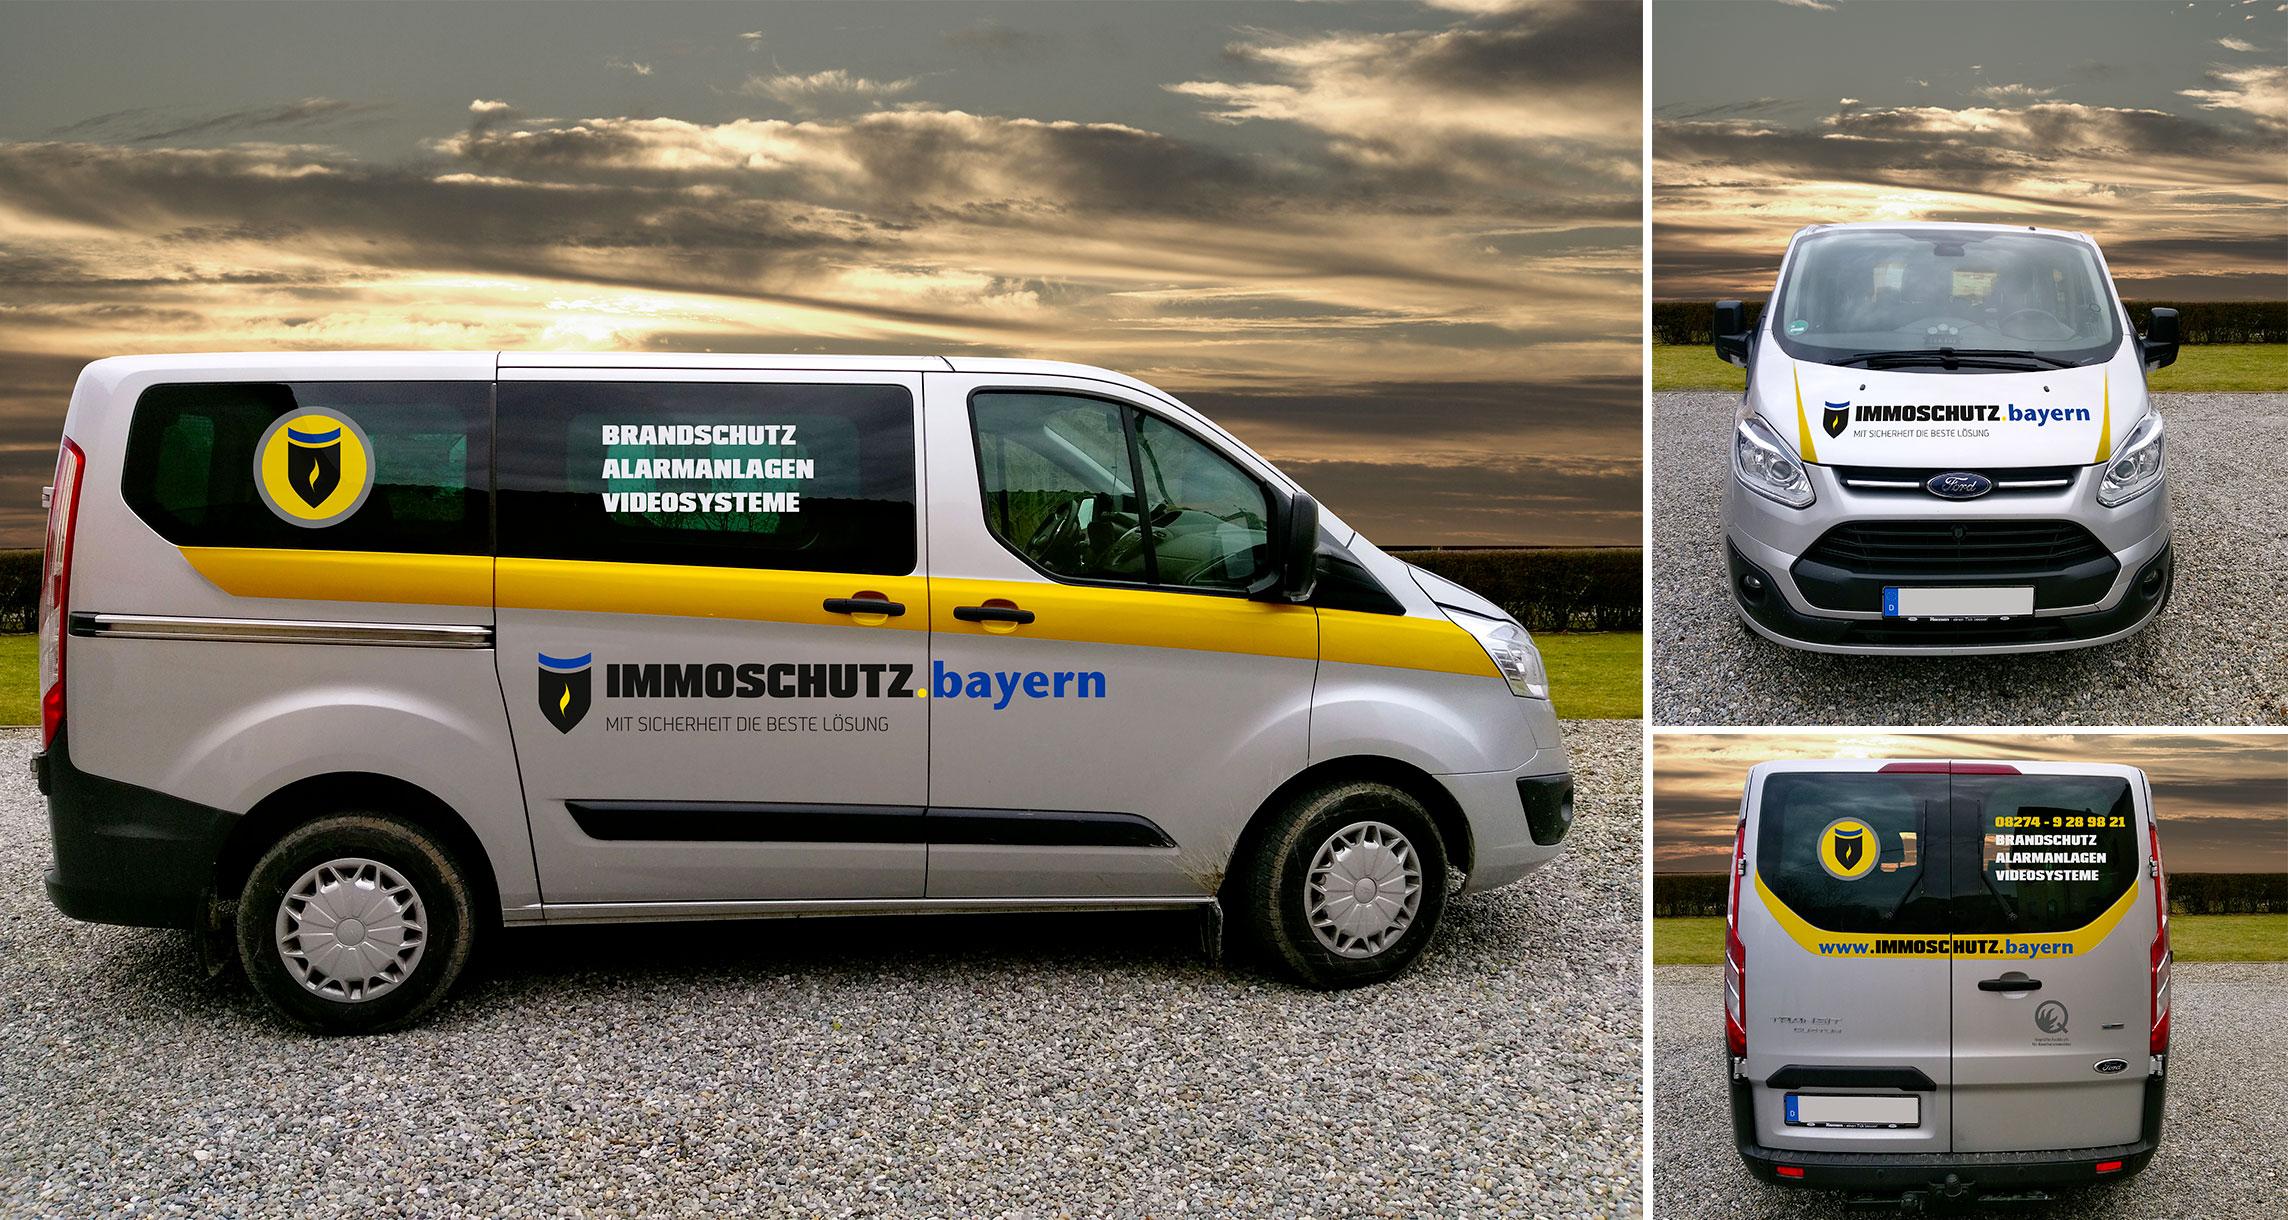 Branding Immoschutz.Bayern: Car Branding